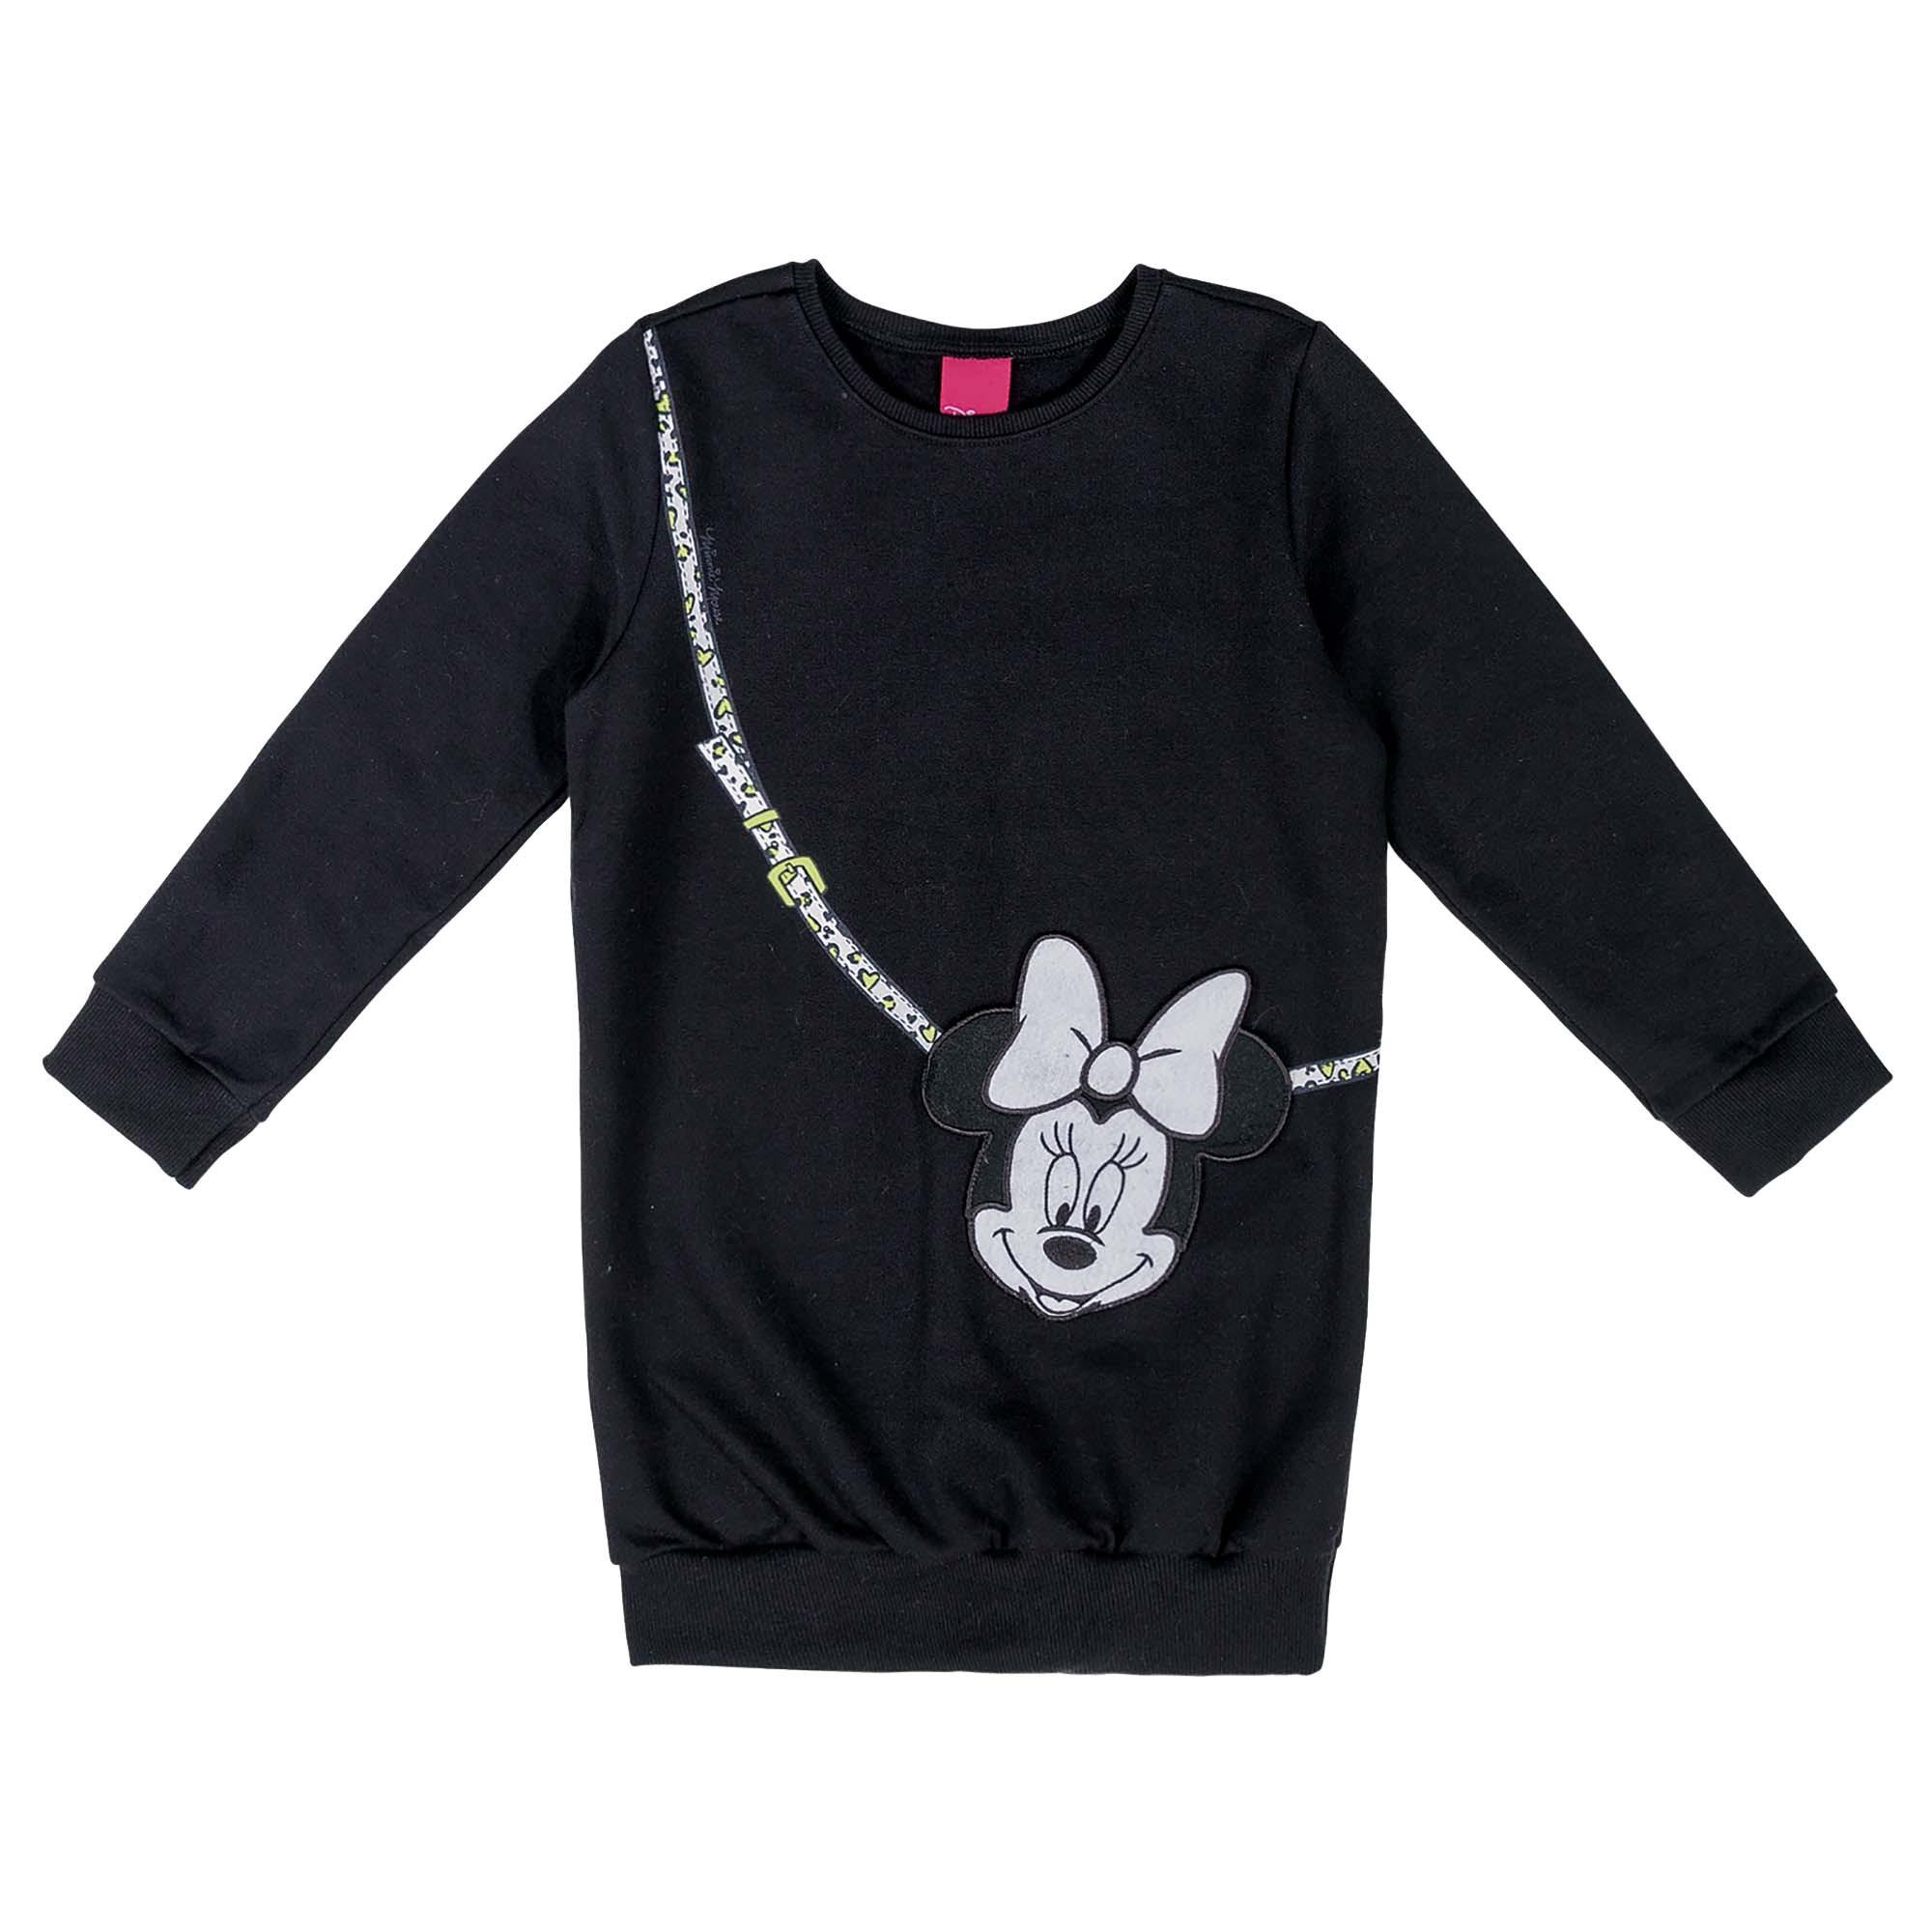 Vestido Inverno Cativa Estampa Bolsa Minnie - 4 ao 10